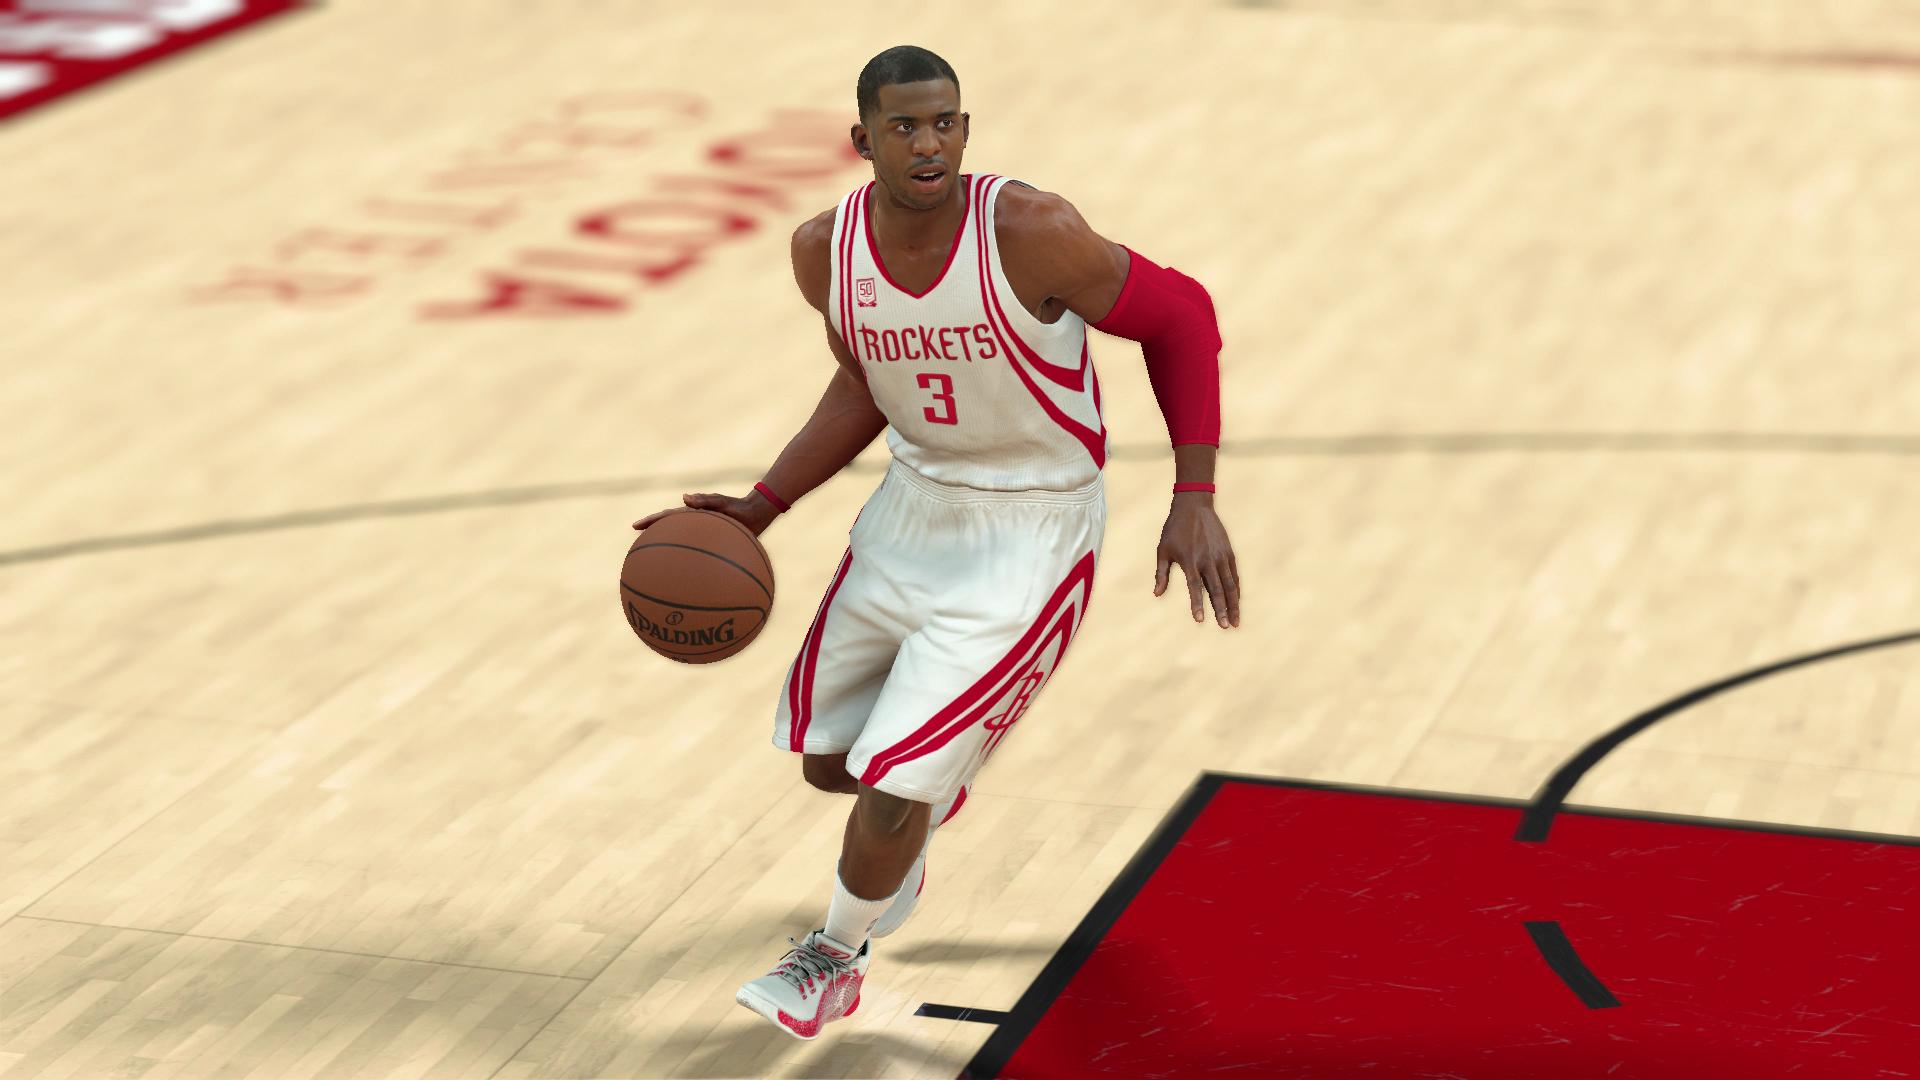 Chris Paul trade gives Rockets NBA's best backcourt, according to 'NBA 2K' | NBA ...